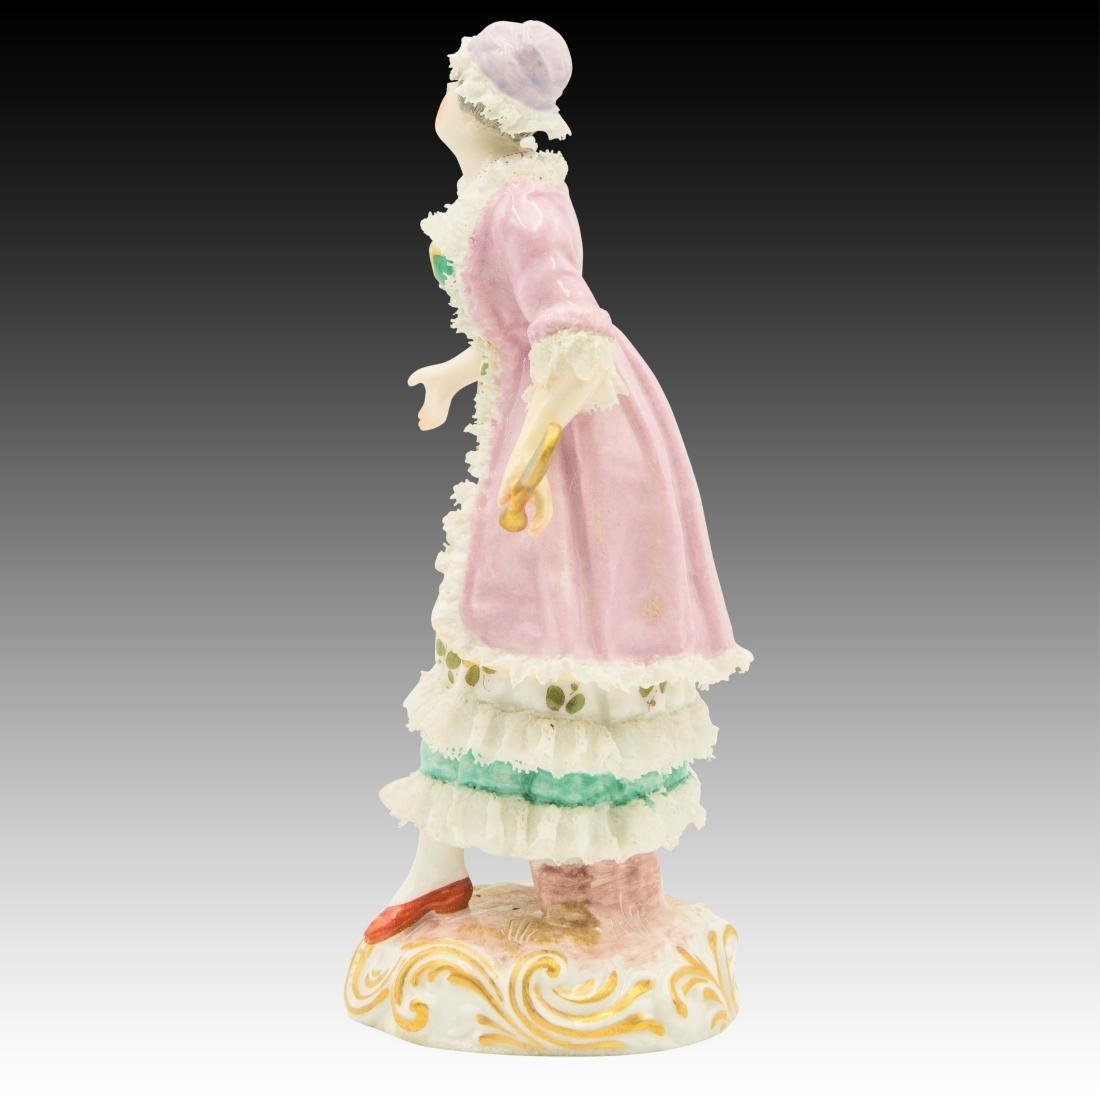 Meissen Maiden Wearing a Lace Dress Figurine - 4